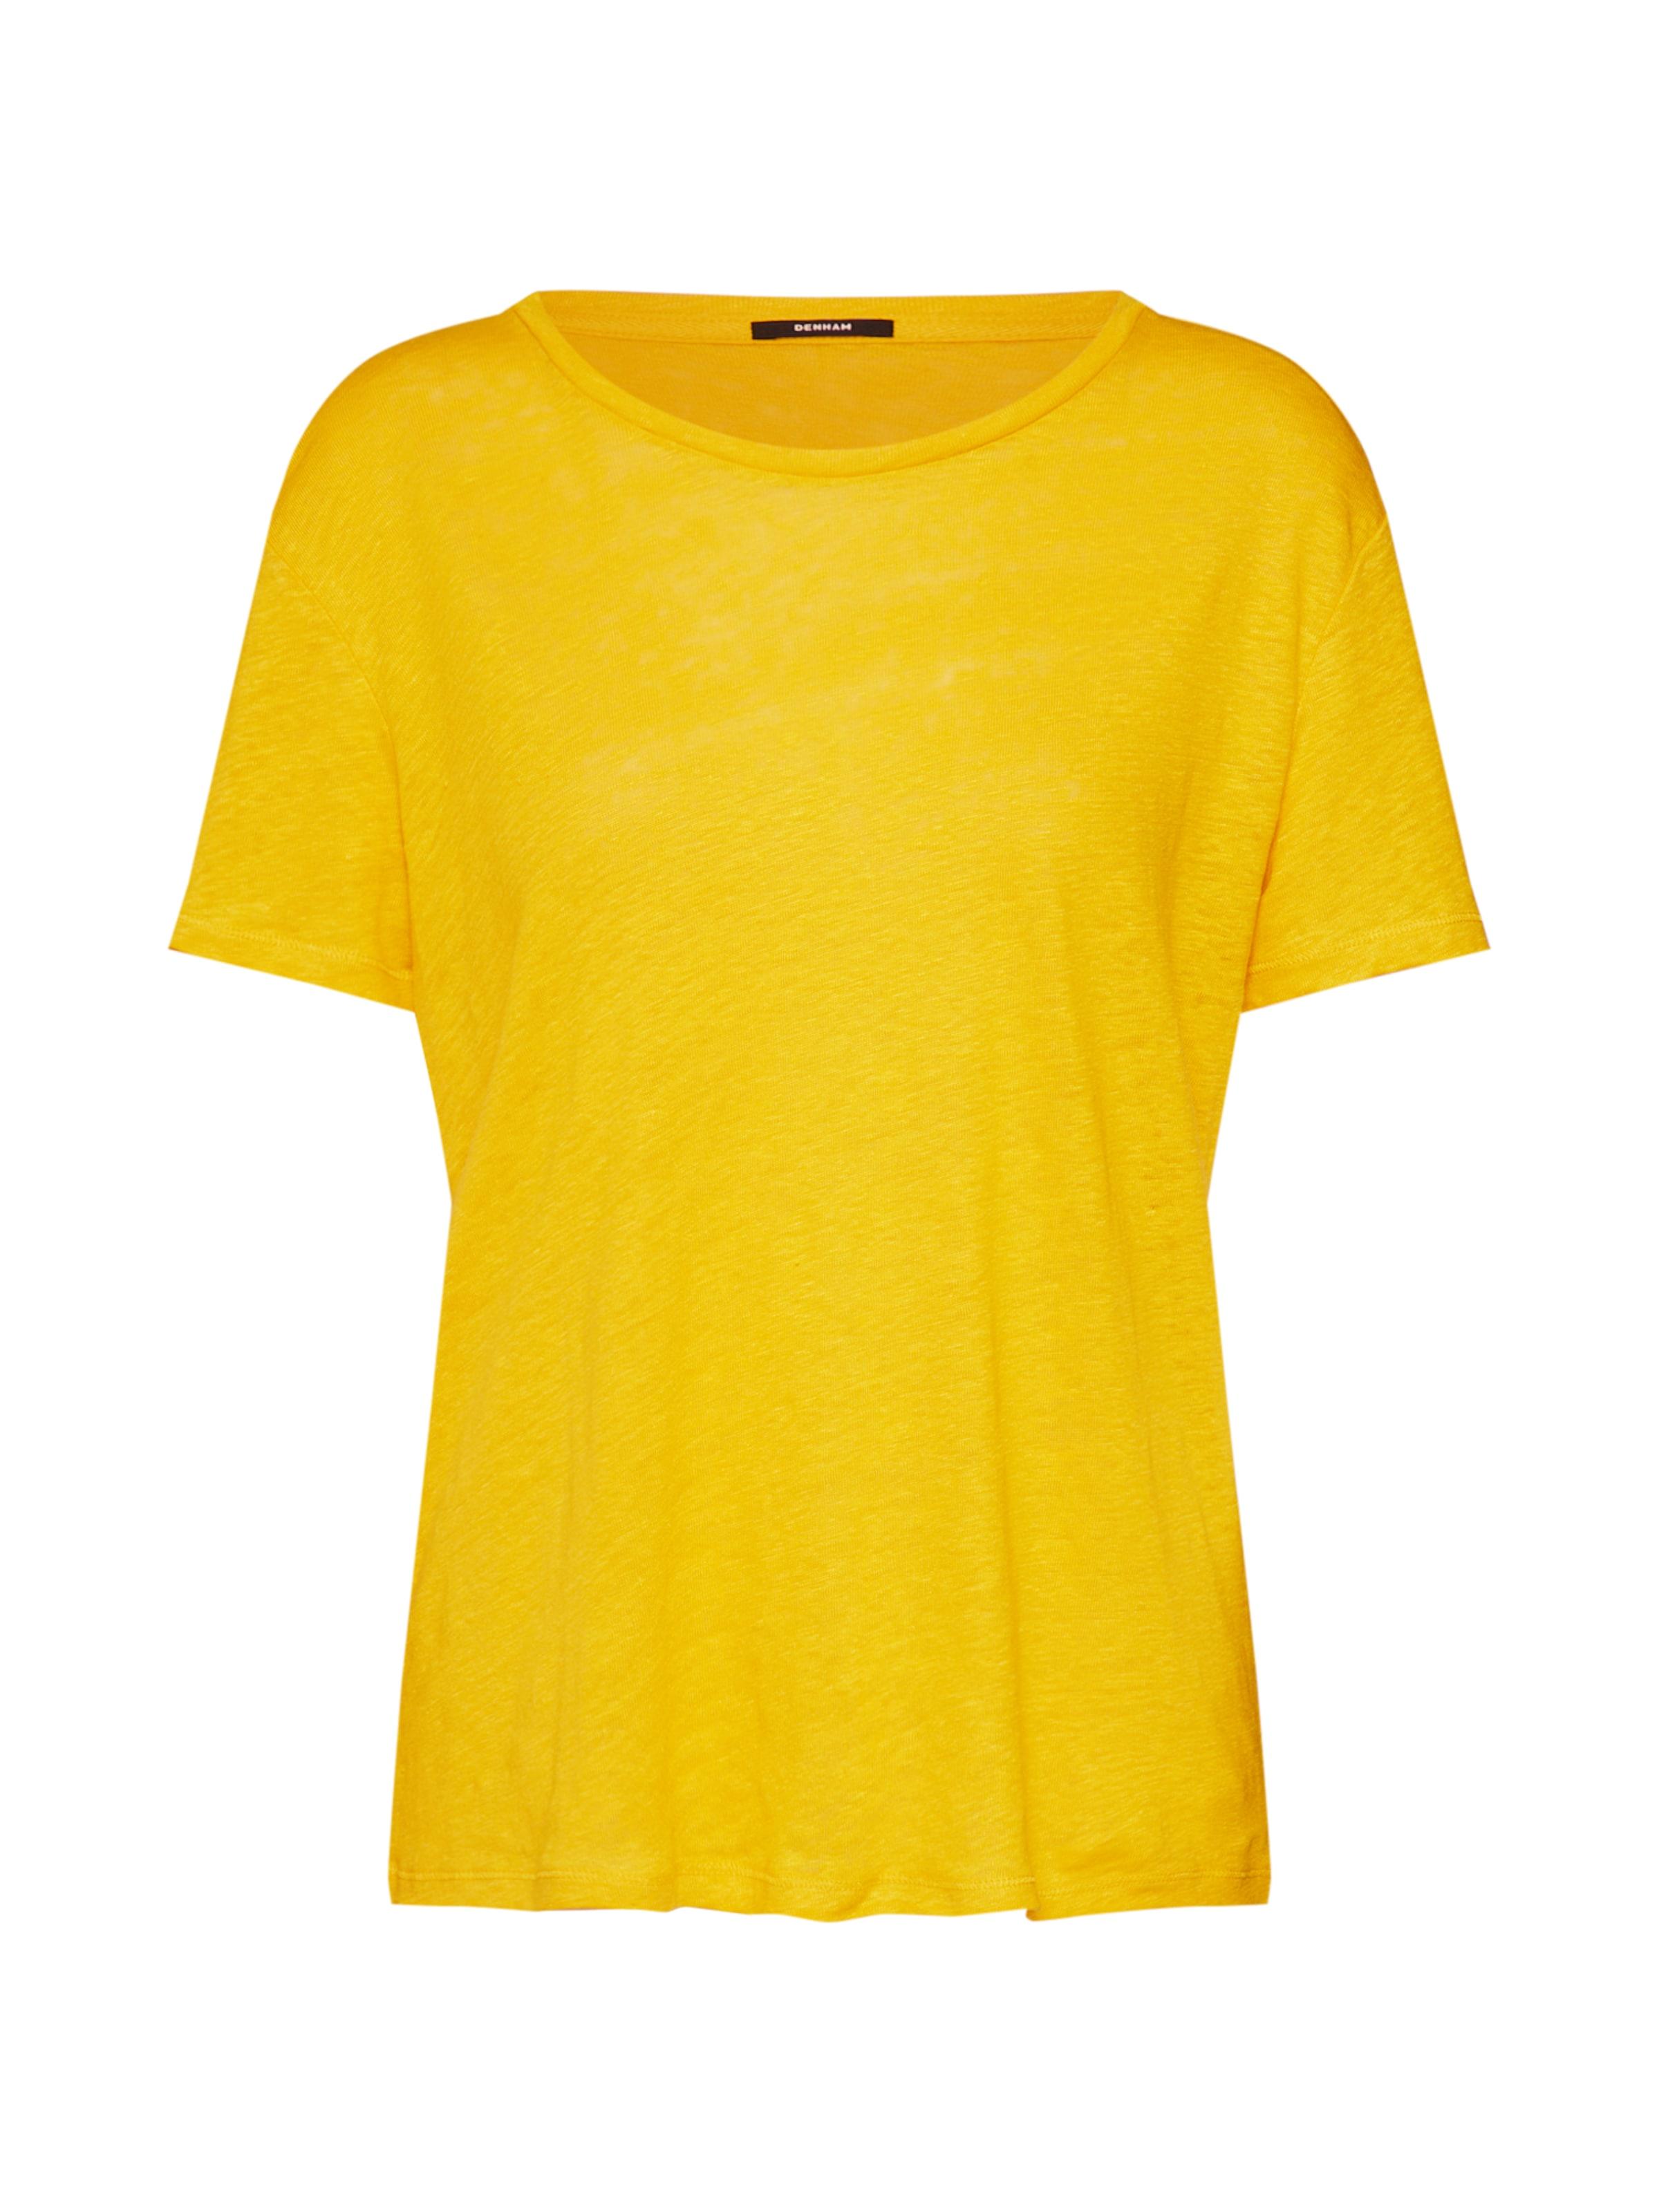 Gelb 'naval In Lj' Shirt Denham Tee dBCoerWx